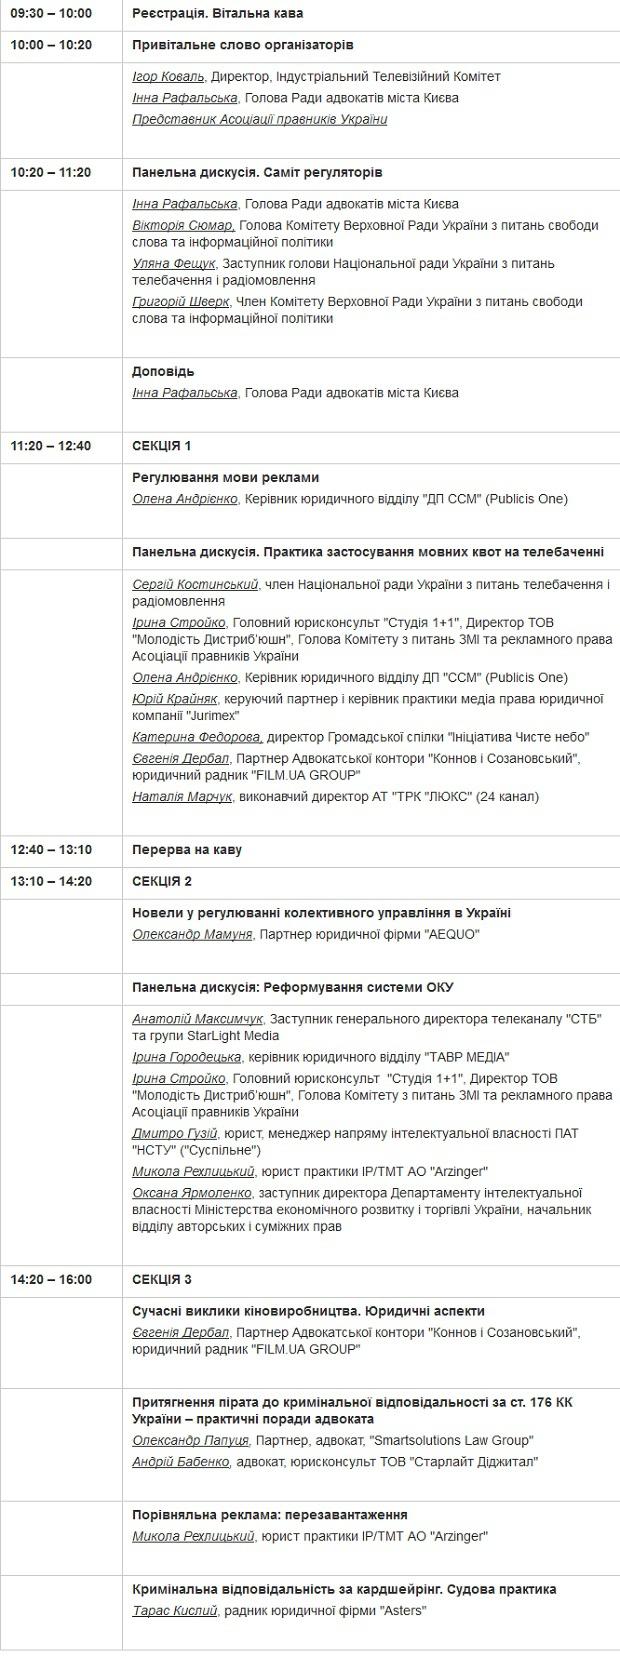 ИТК, Медиаправо